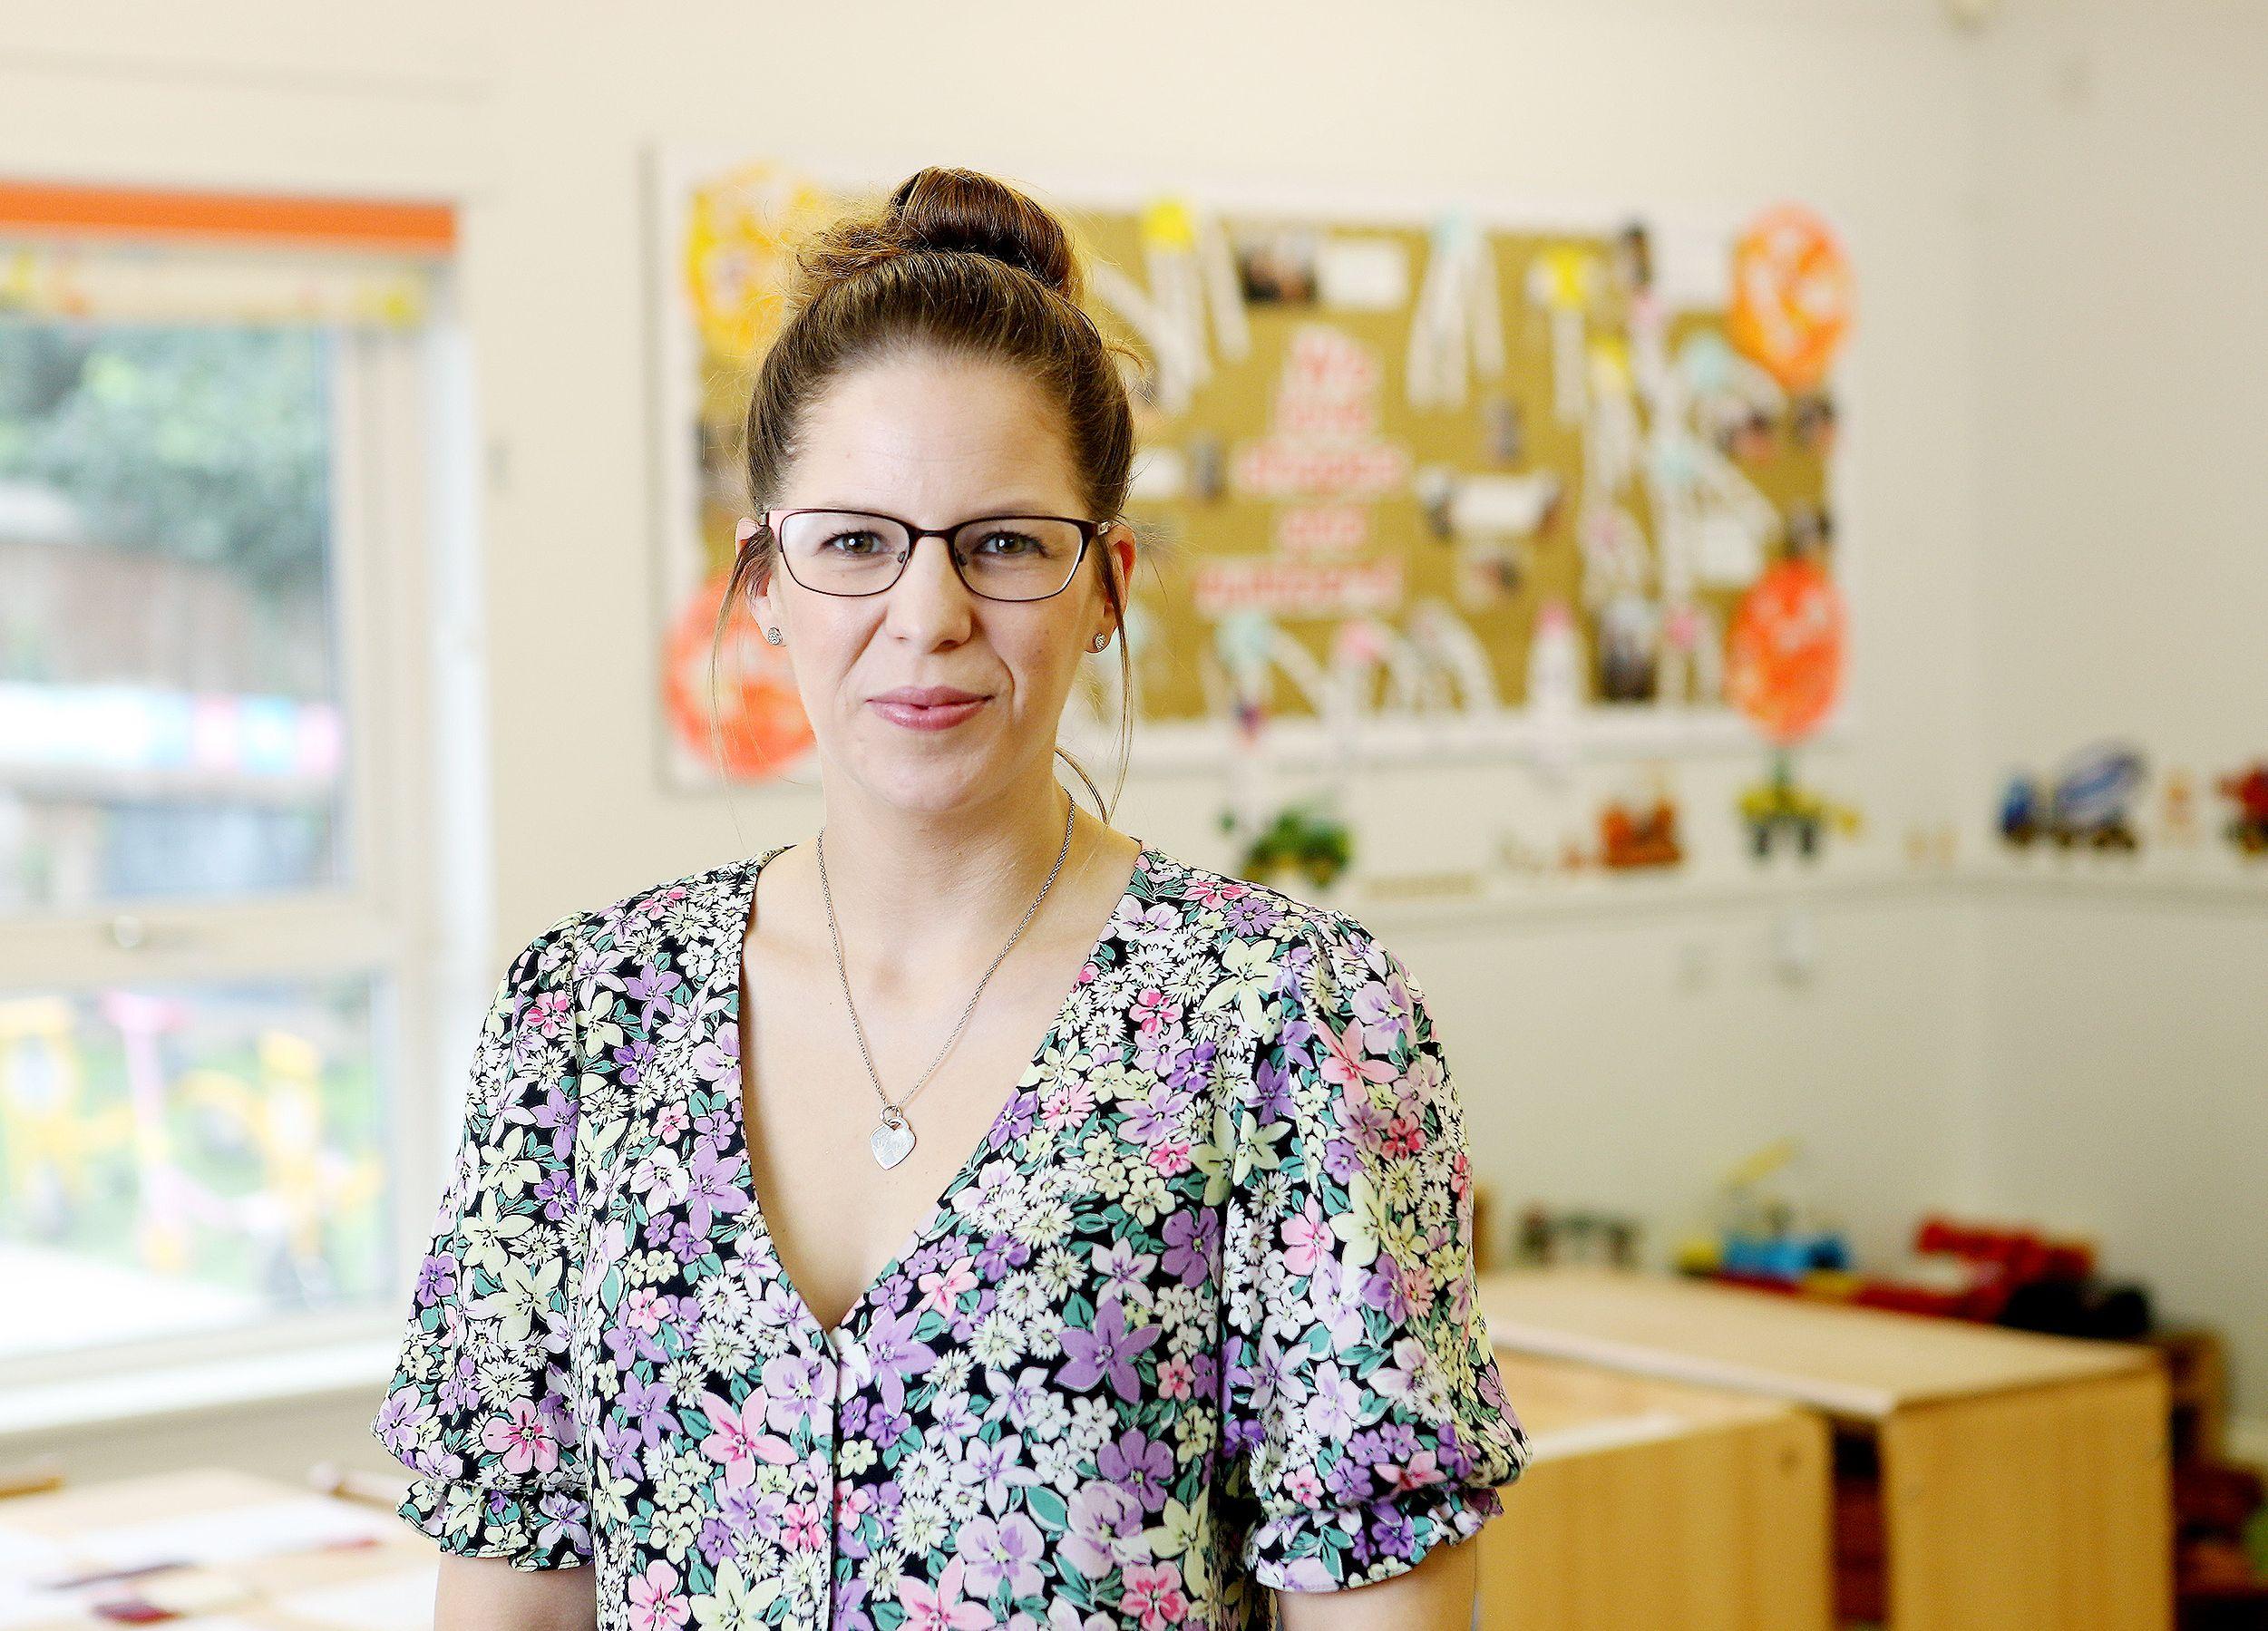 Kelly Clarkson - Centre Director